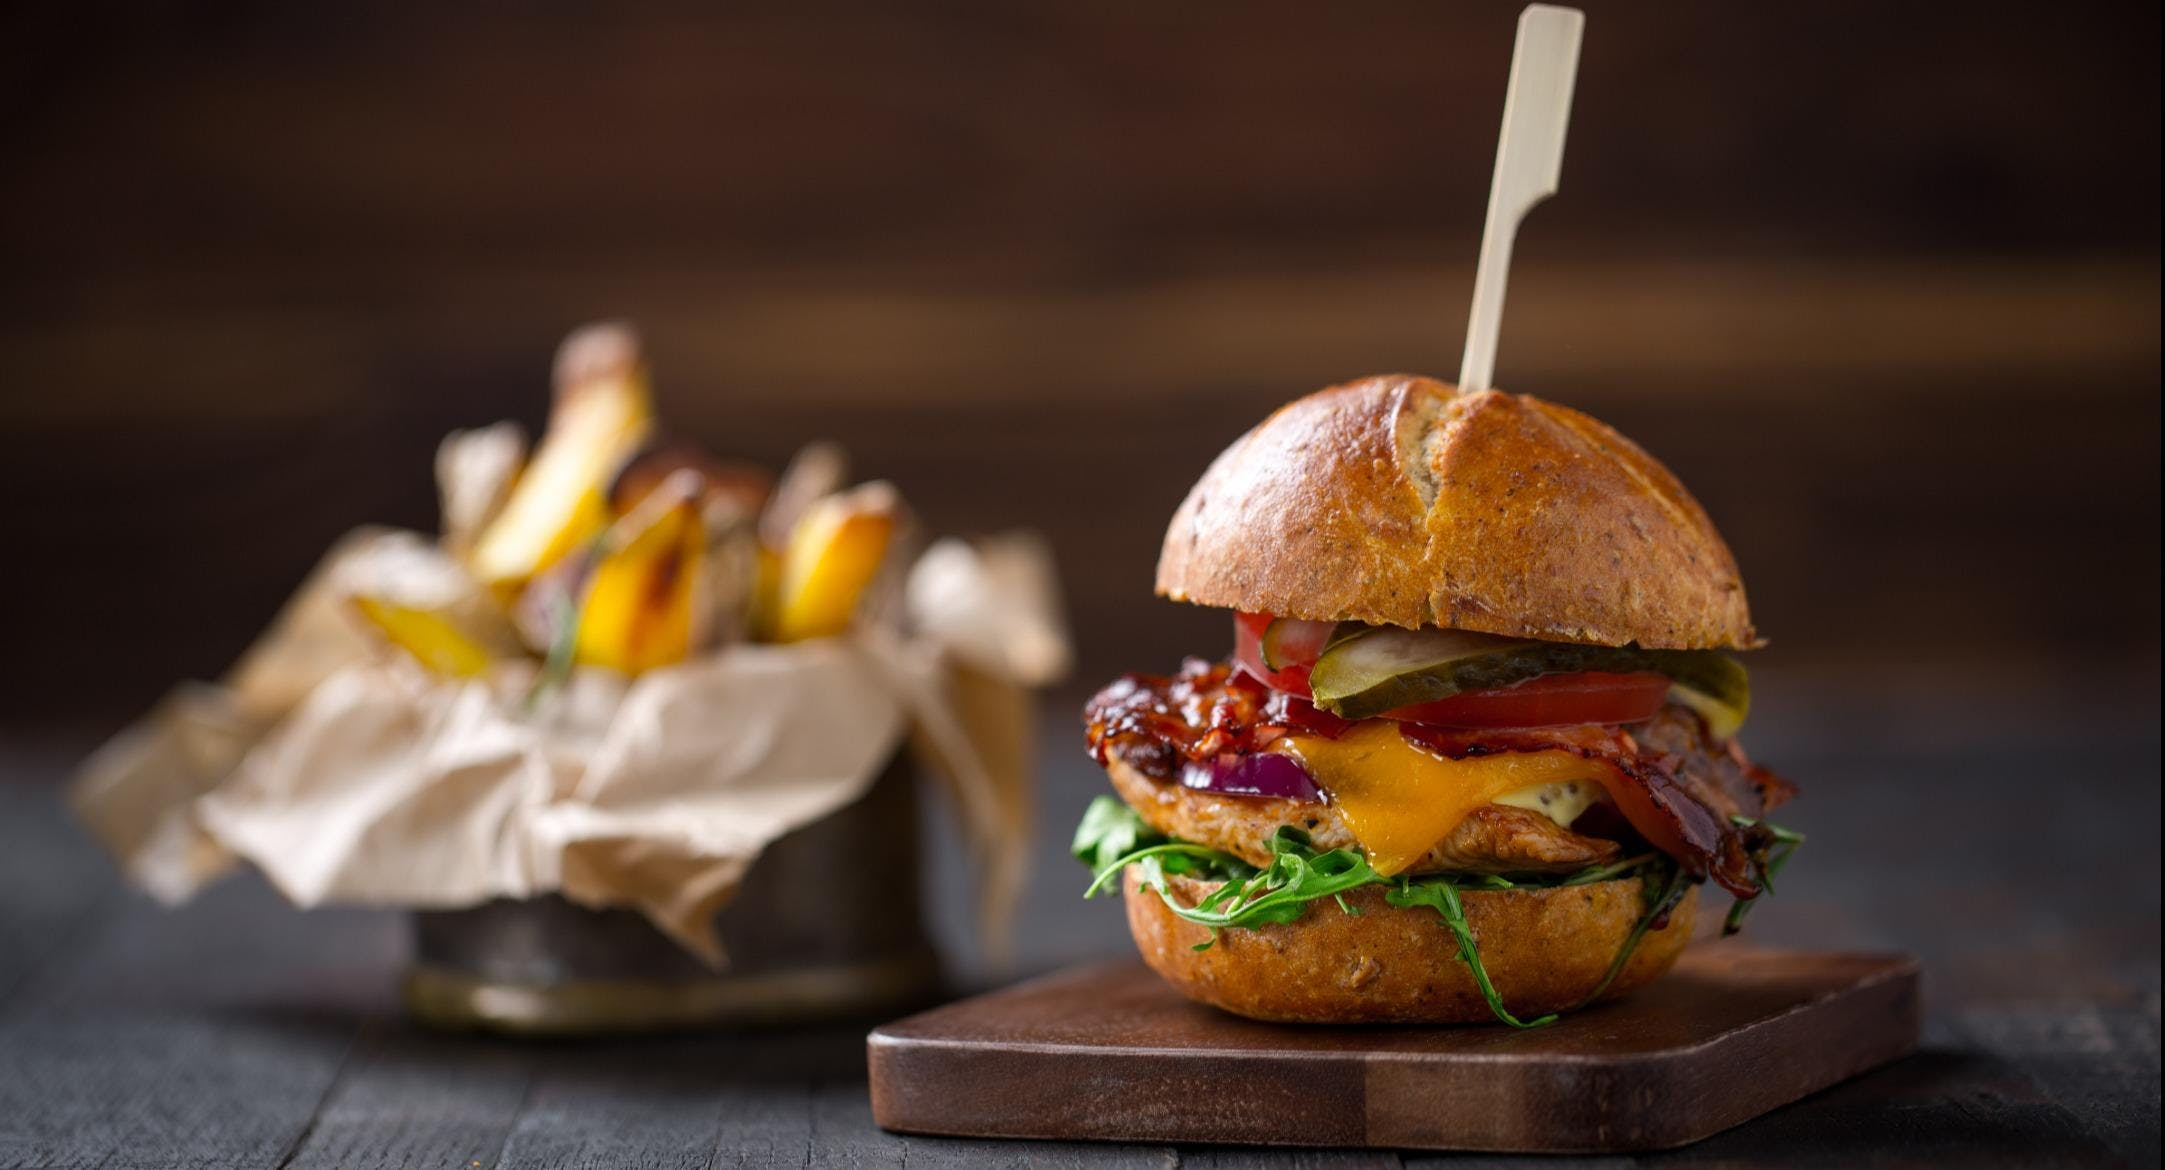 Tru Burger Birmingham image 1